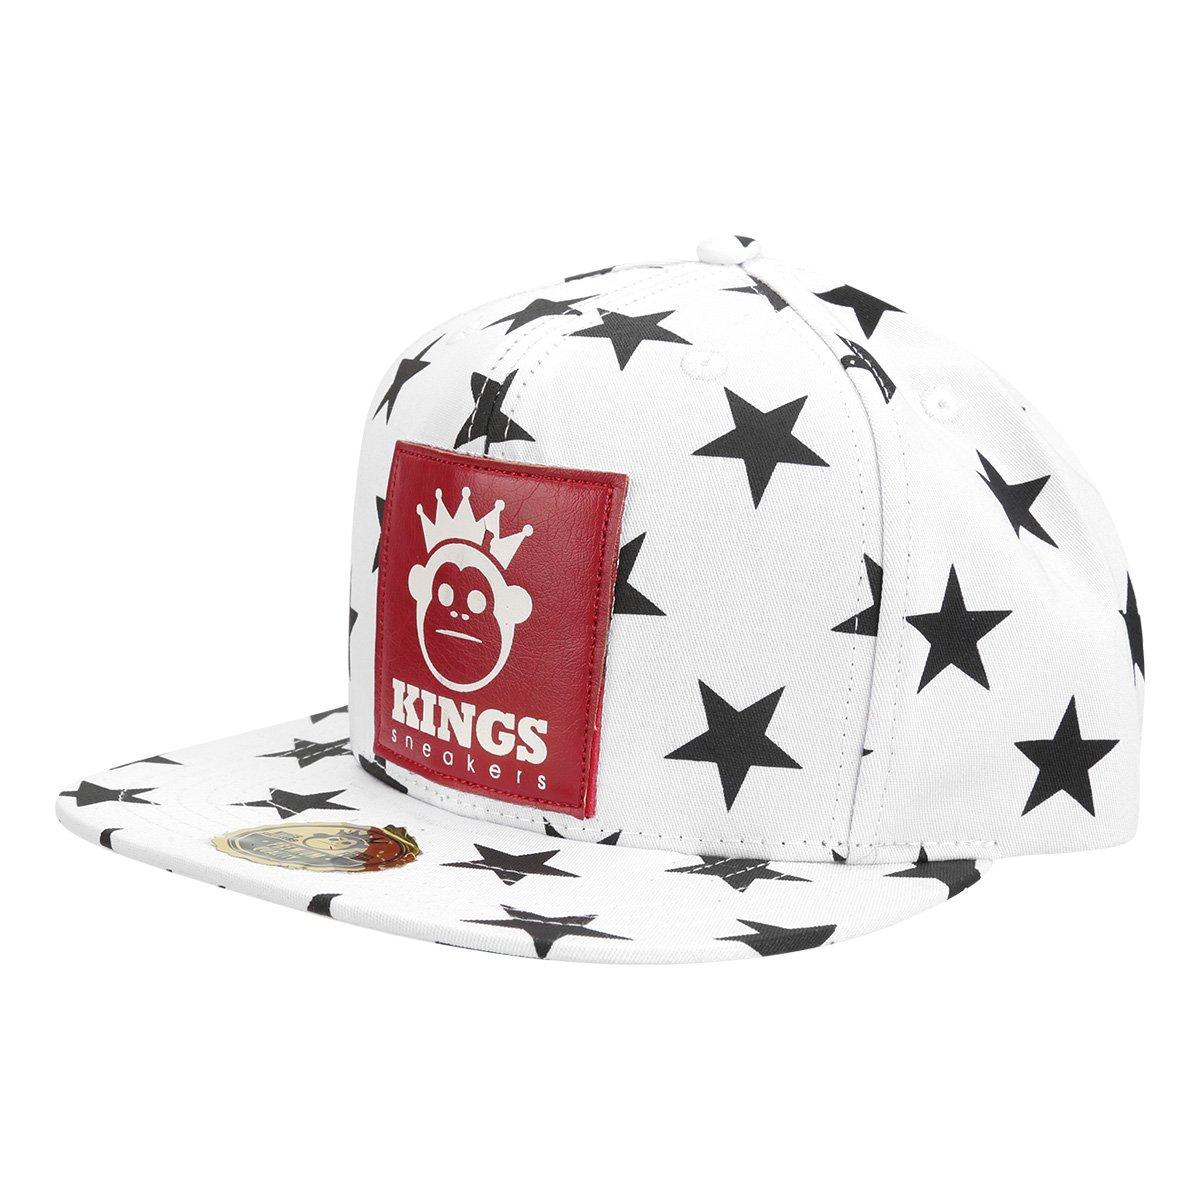 Boné Kings Sneakers Prm Stars - Compre Agora  1da09c7107a